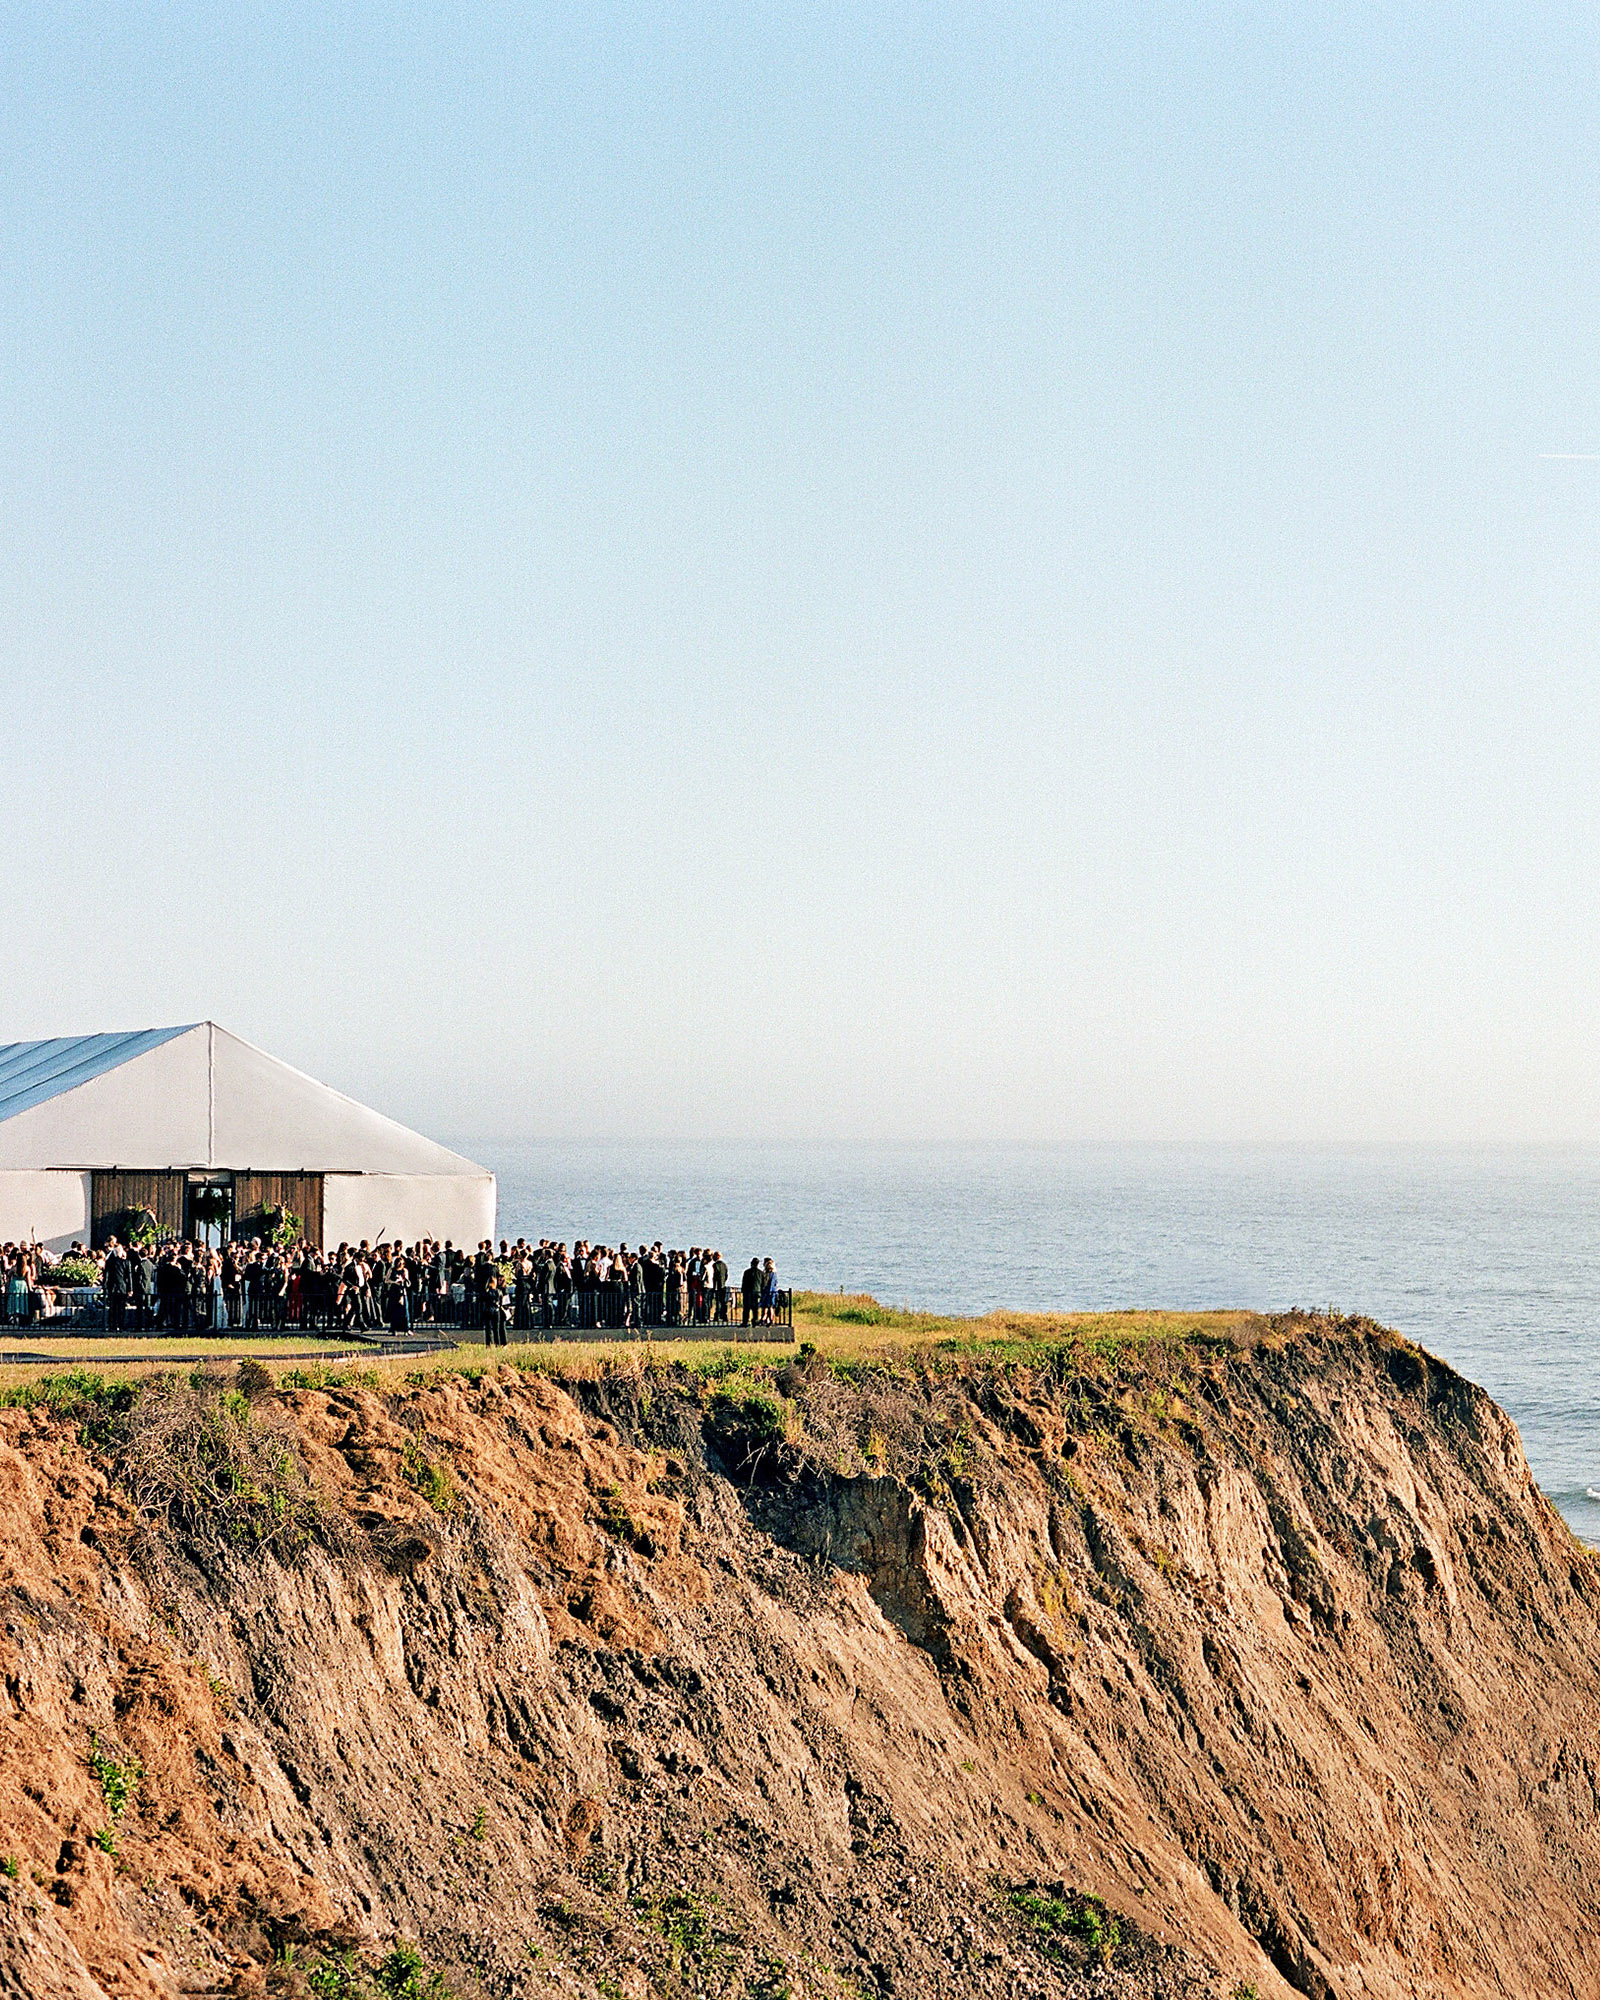 whitney zach wedding reception on bluff